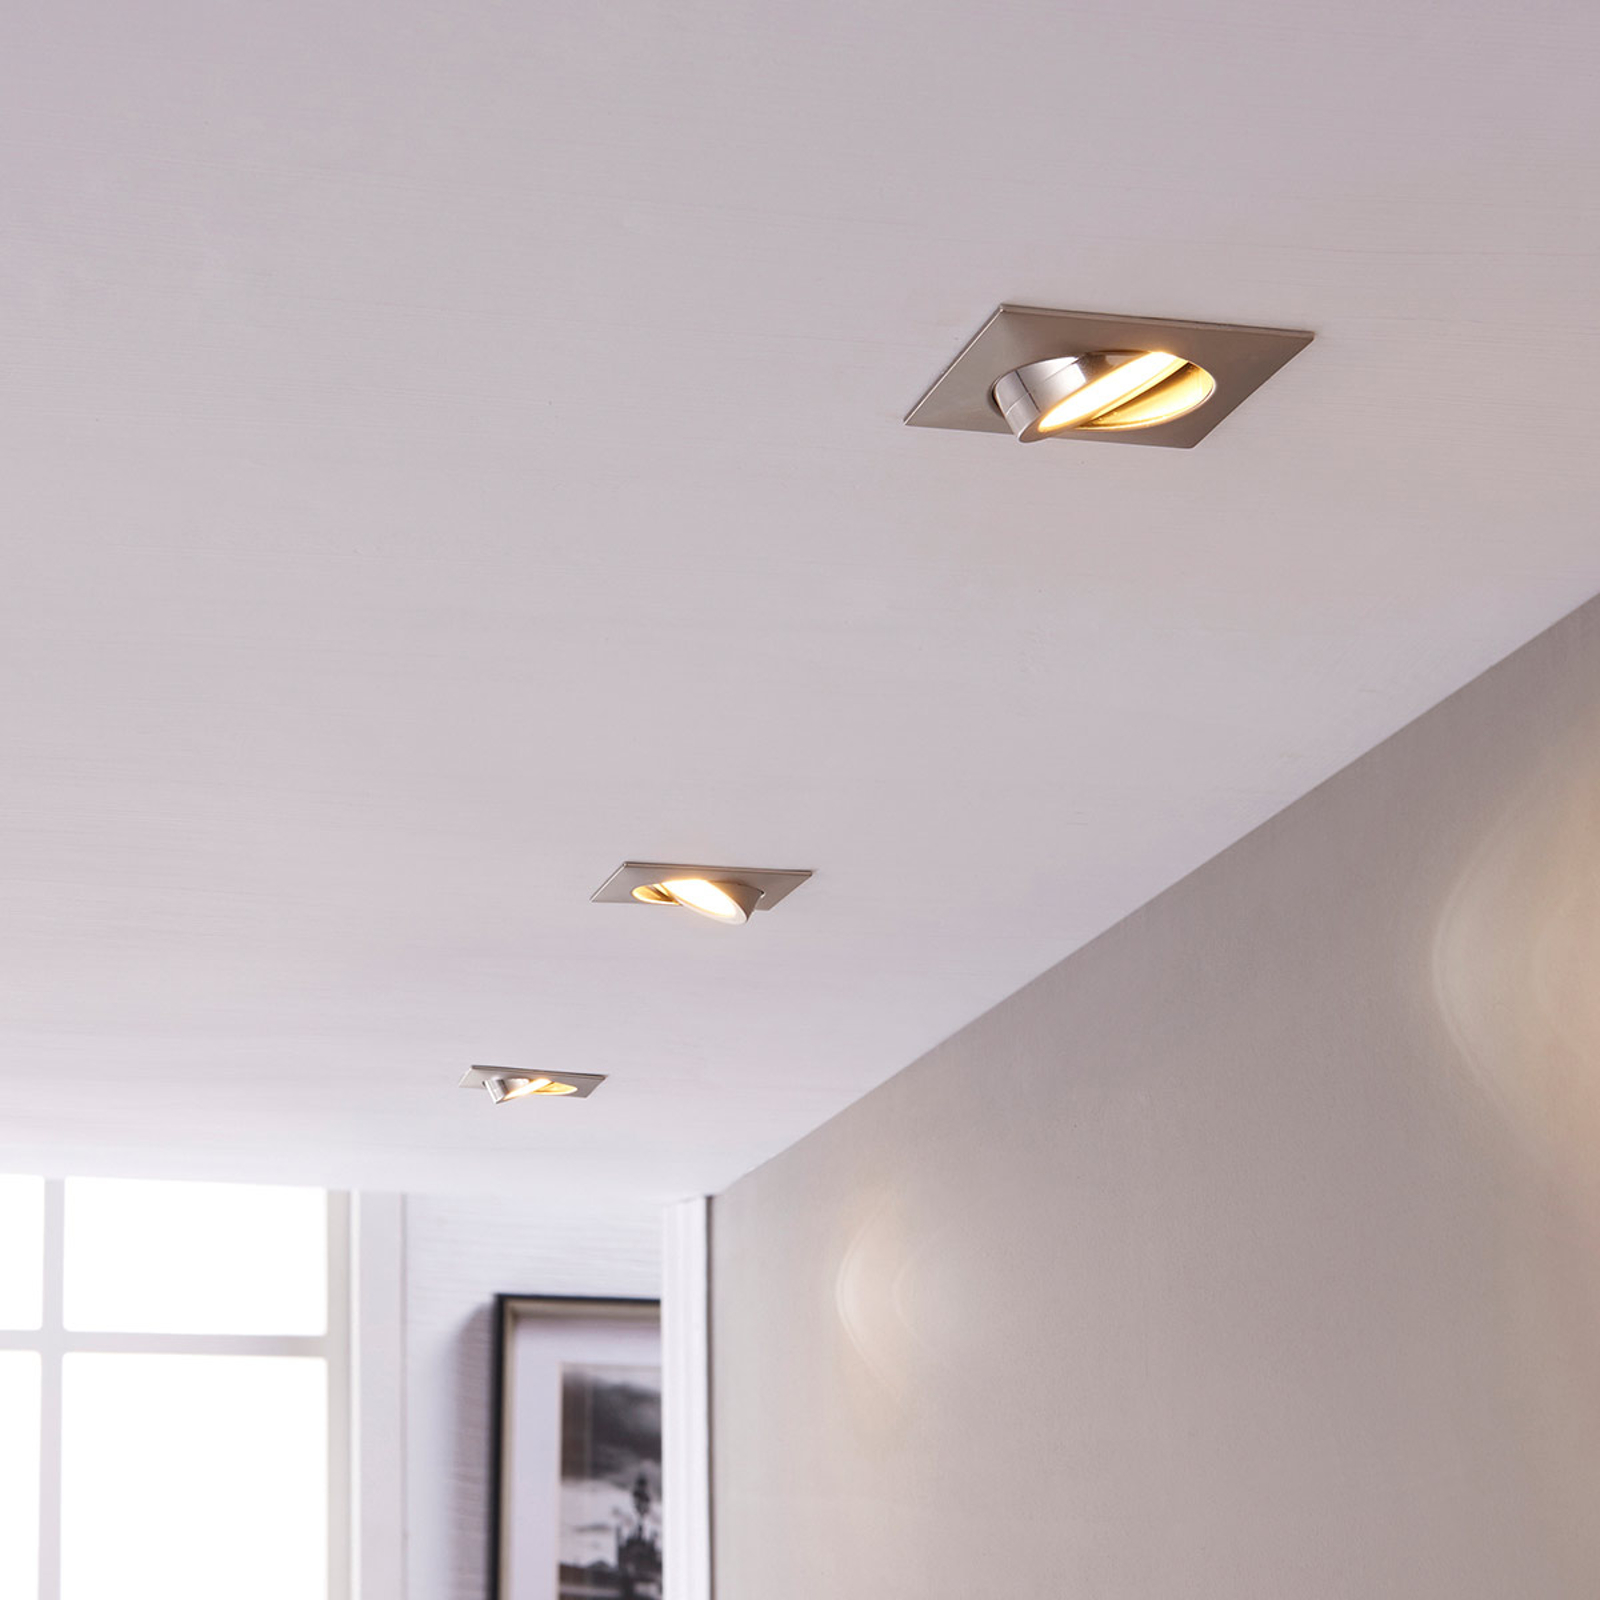 LED-Einbaustrahler Andrej, eckig, nickel, 3er-Set